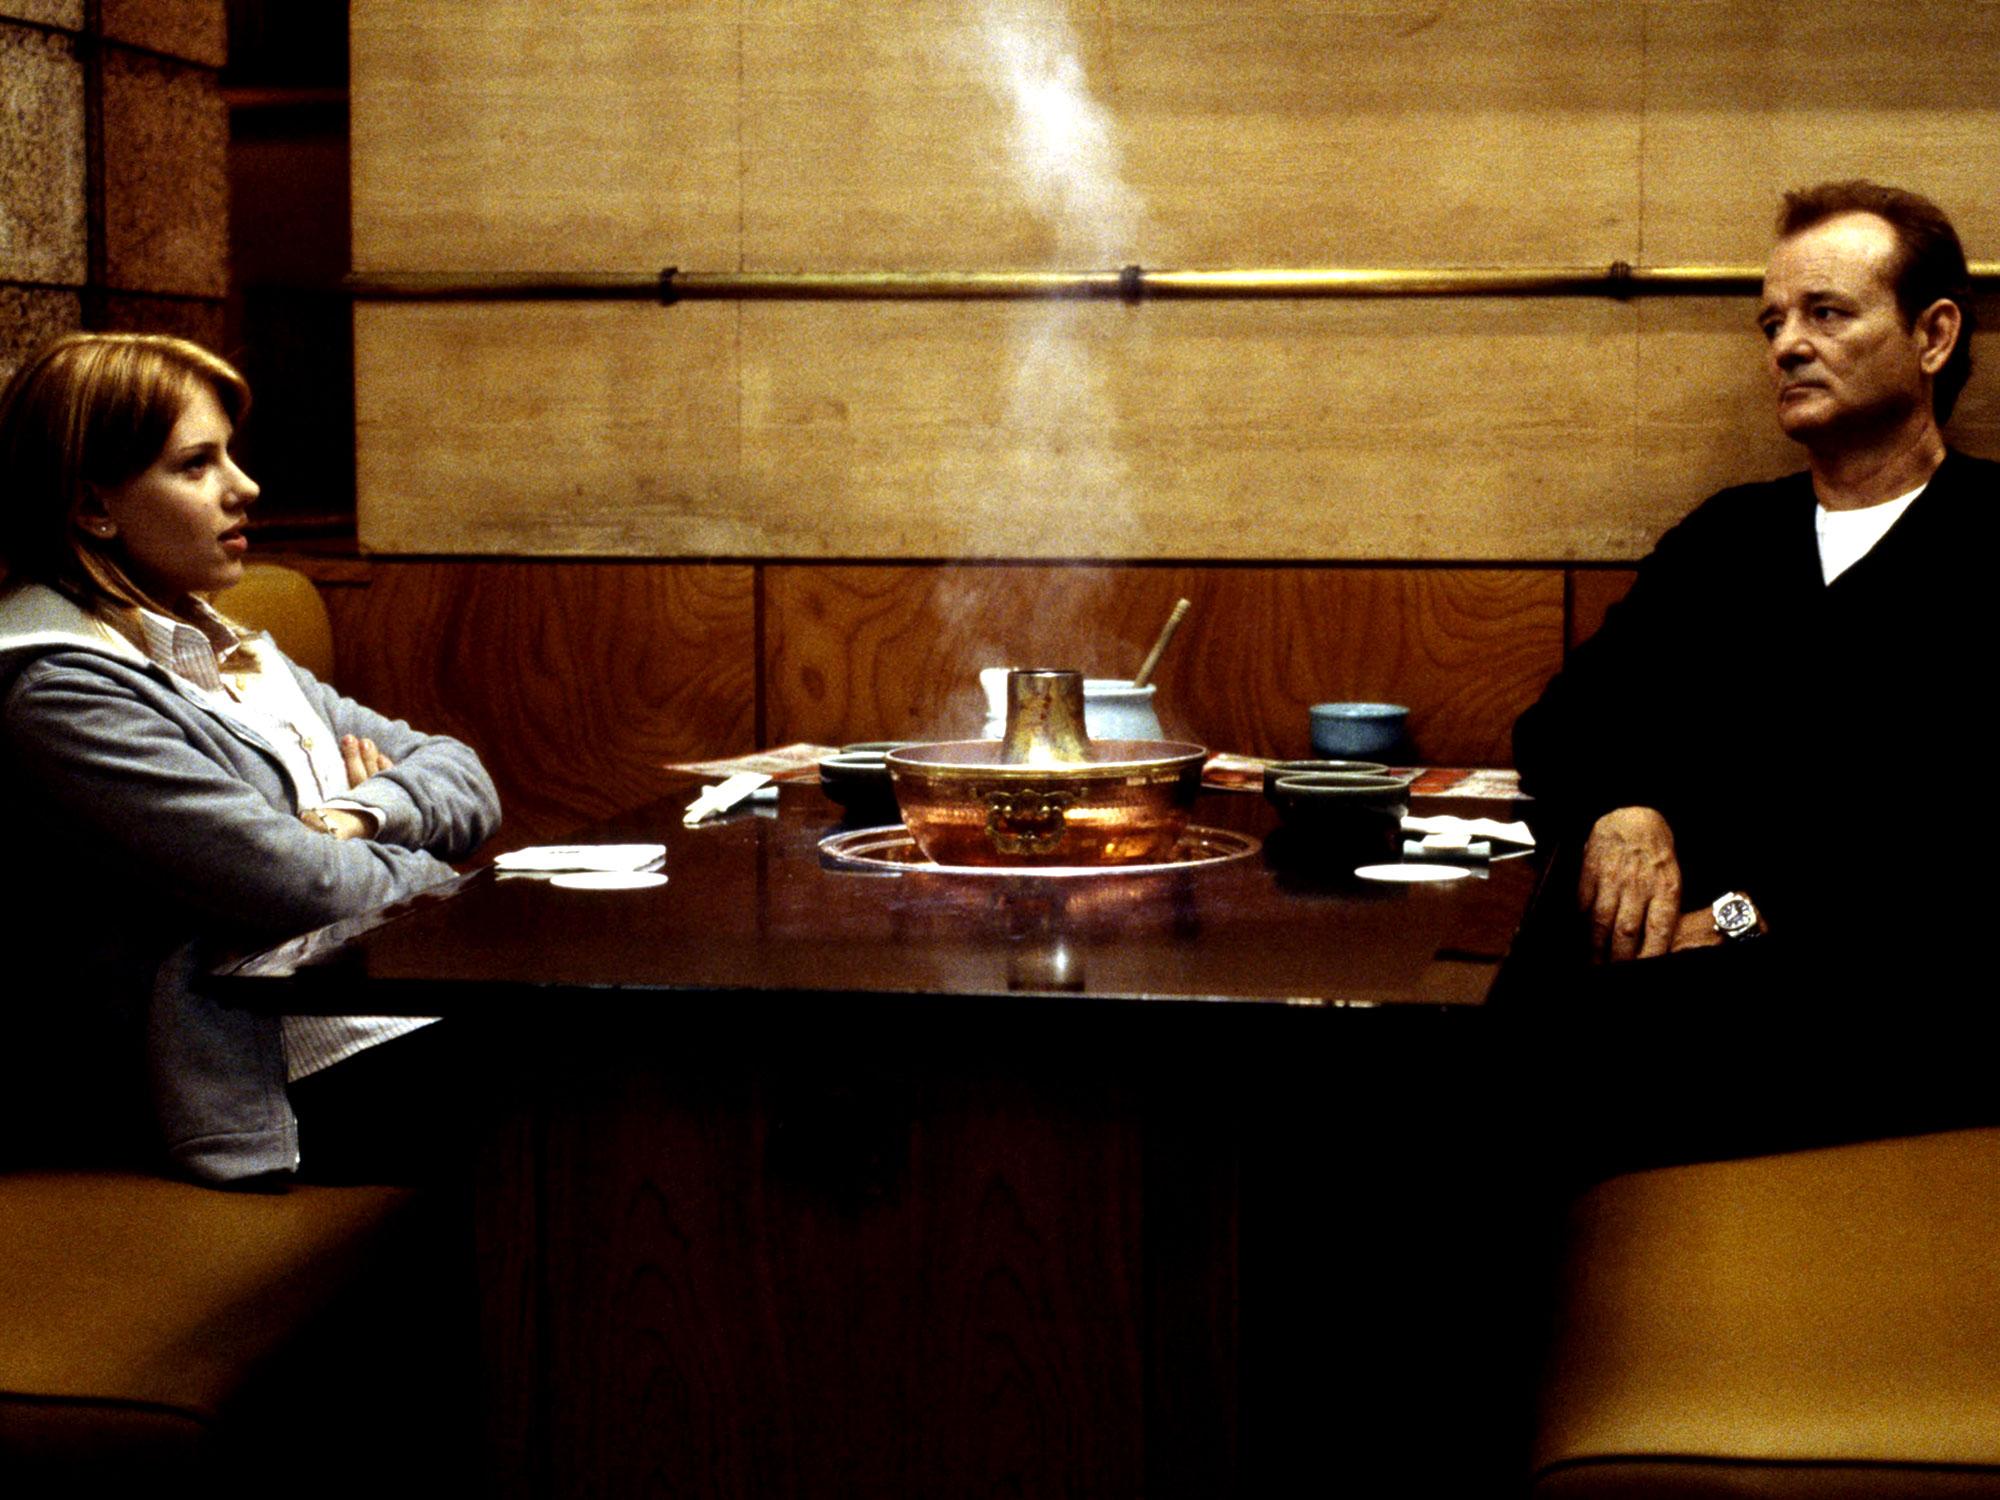 Scarlett Johansson and Bill Murray in Lost in Translation (2003)